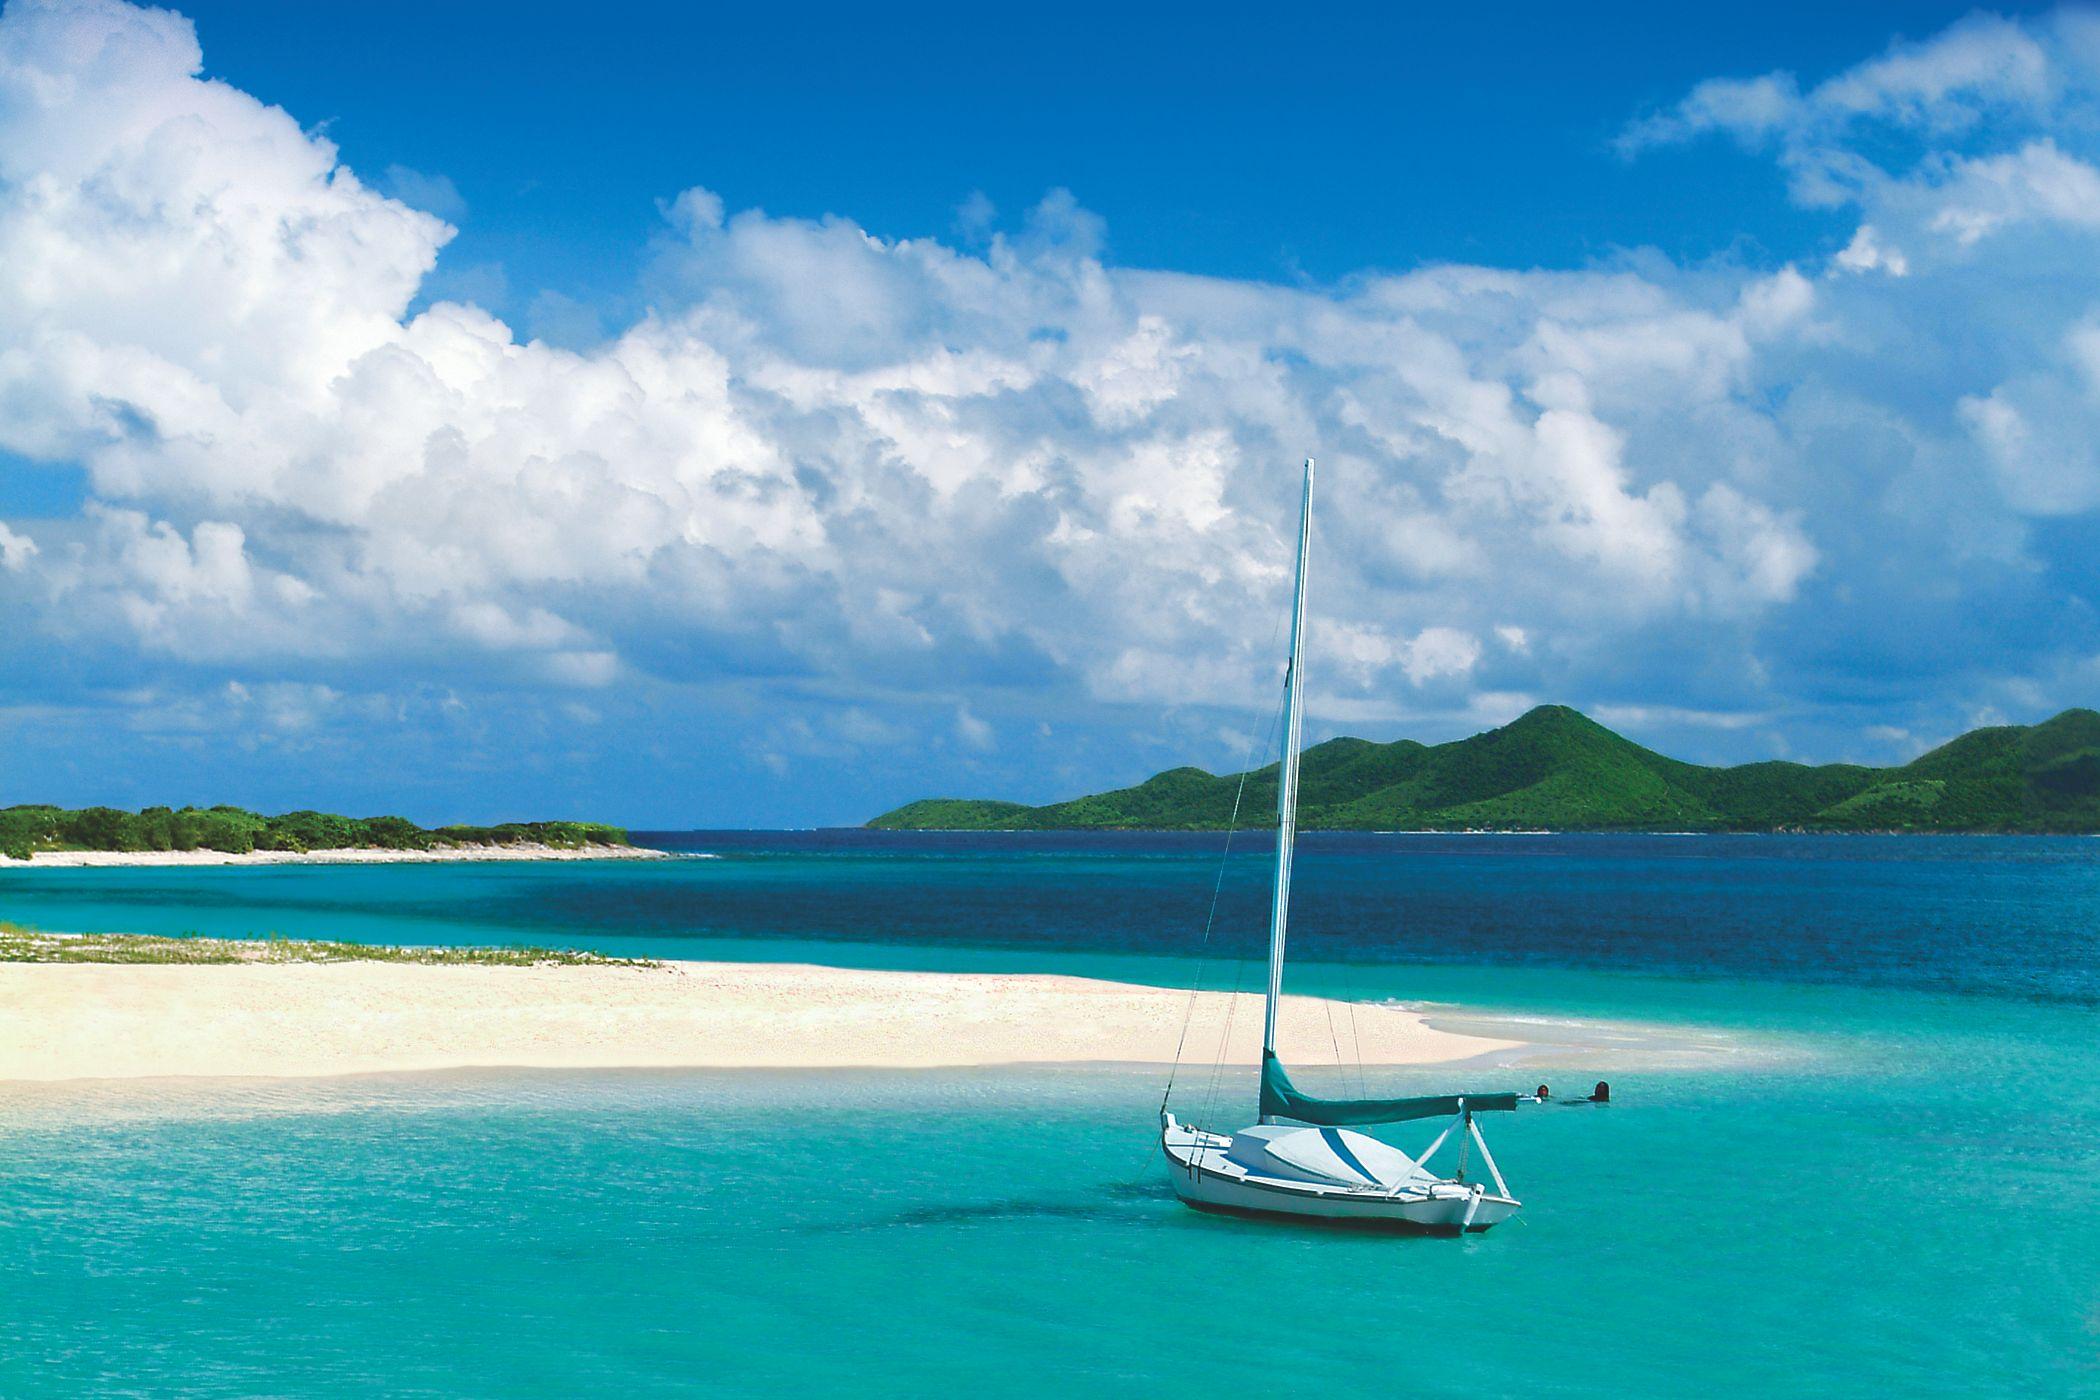 Us virgin islands dating sites